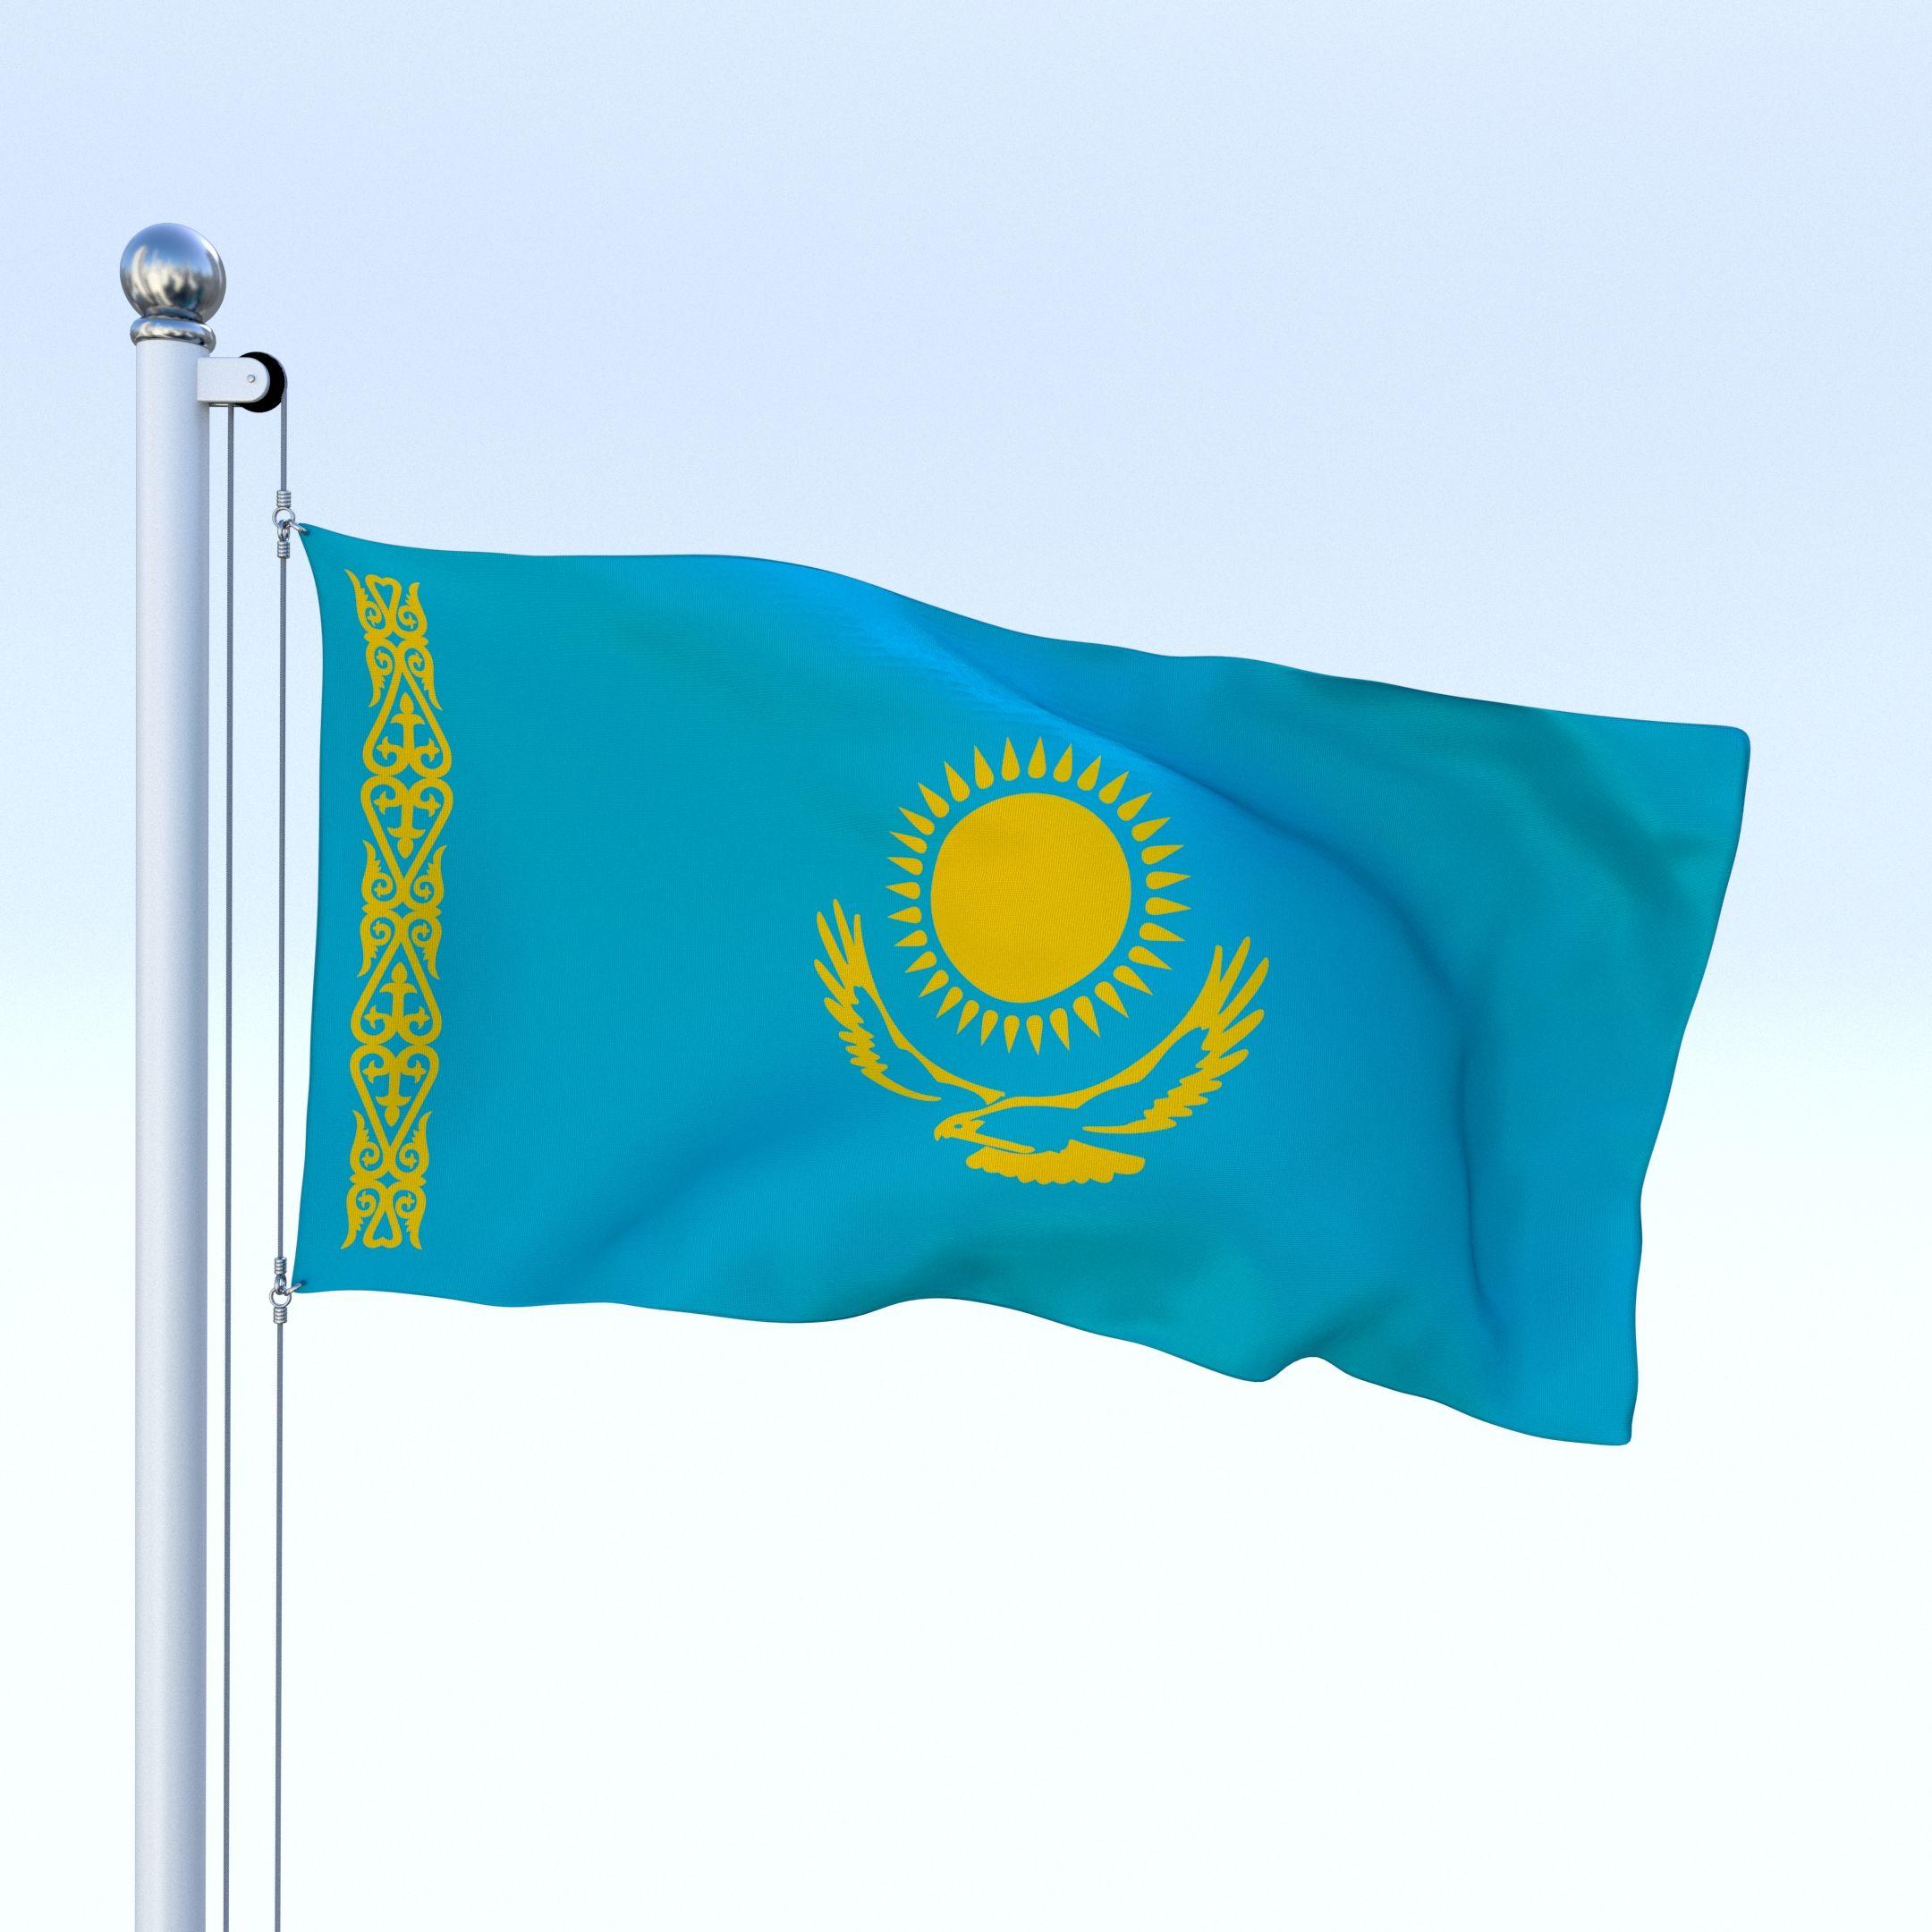 Kazakh Animated, Dramatic and Historic Films Shown at ... |Kazakhstan Animation